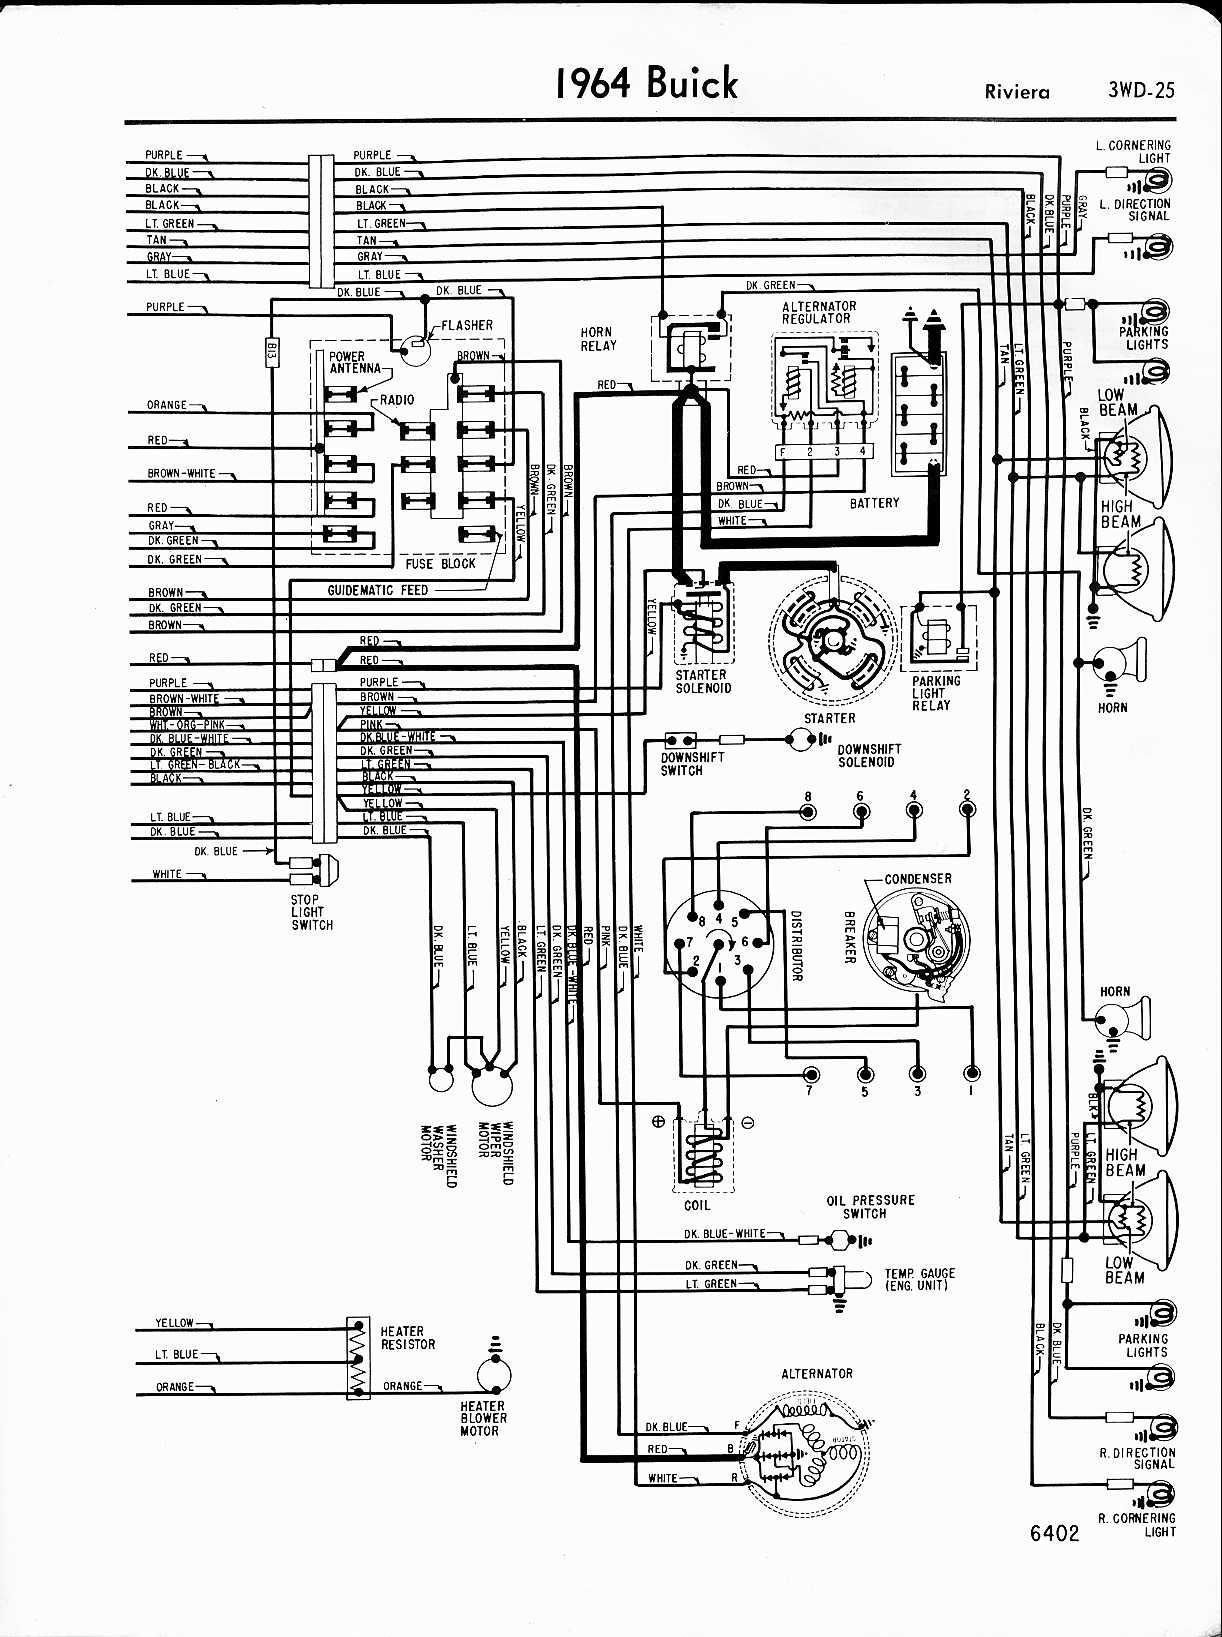 1958 Pontiac Chieftain Parts Wiring Diagram